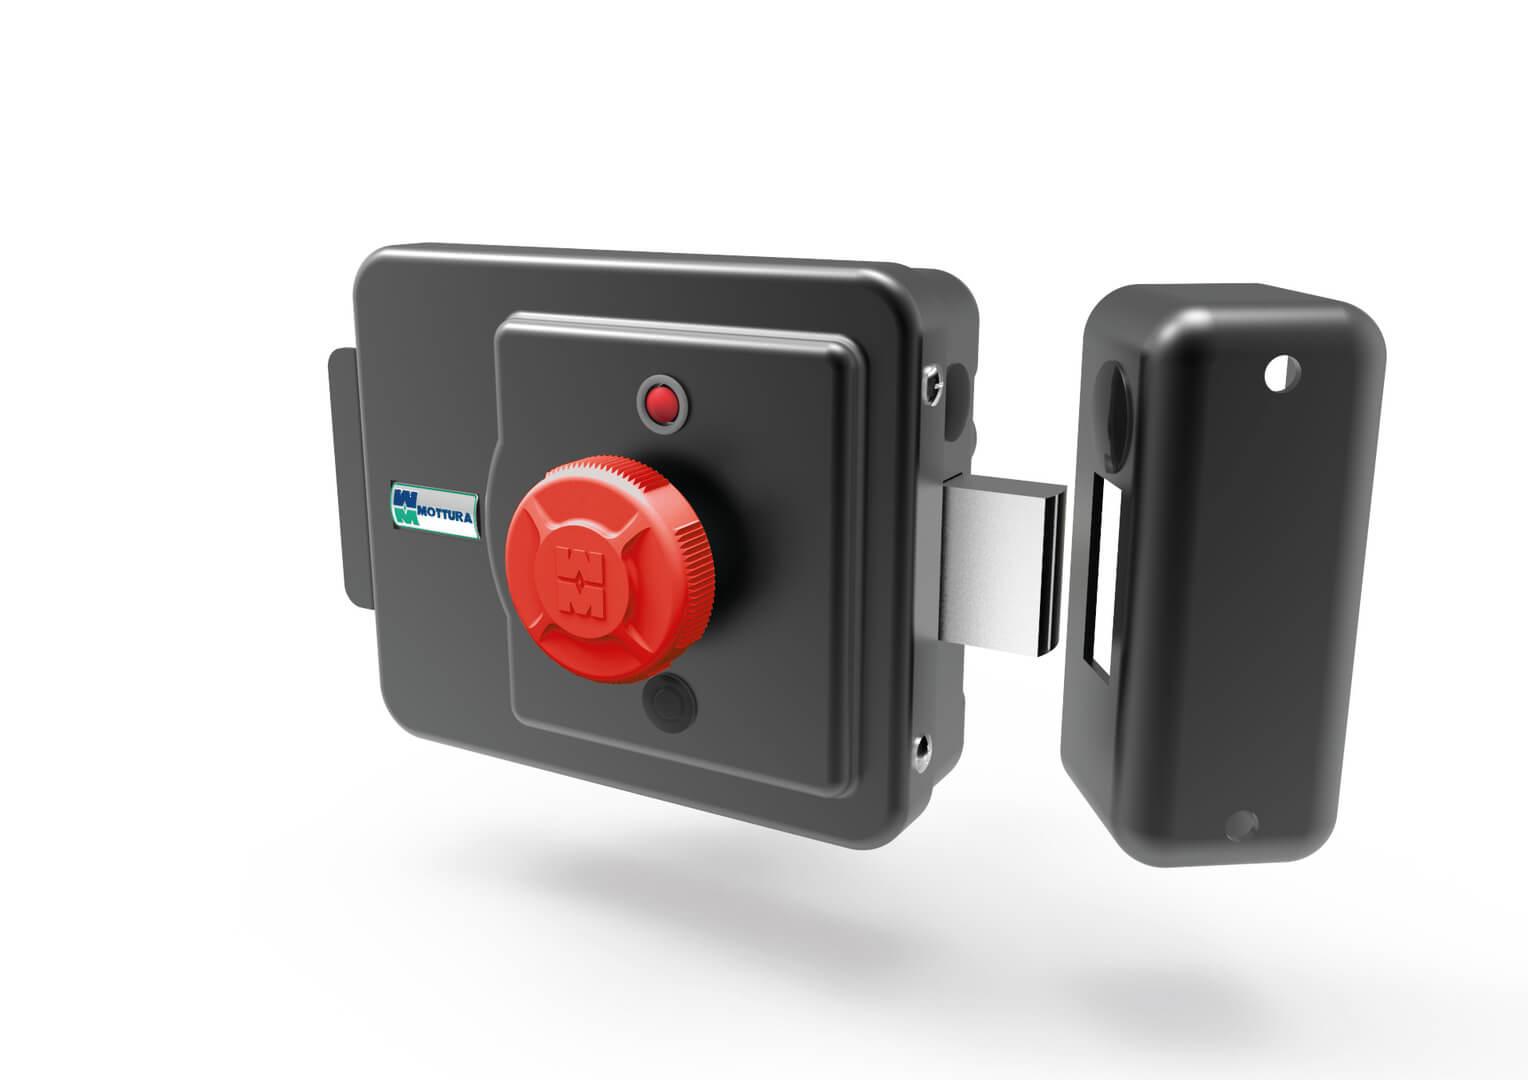 Mottura x technology e serrature elettriche mottura serrature di sicurezza - Serrature per porte interne prezzi ...